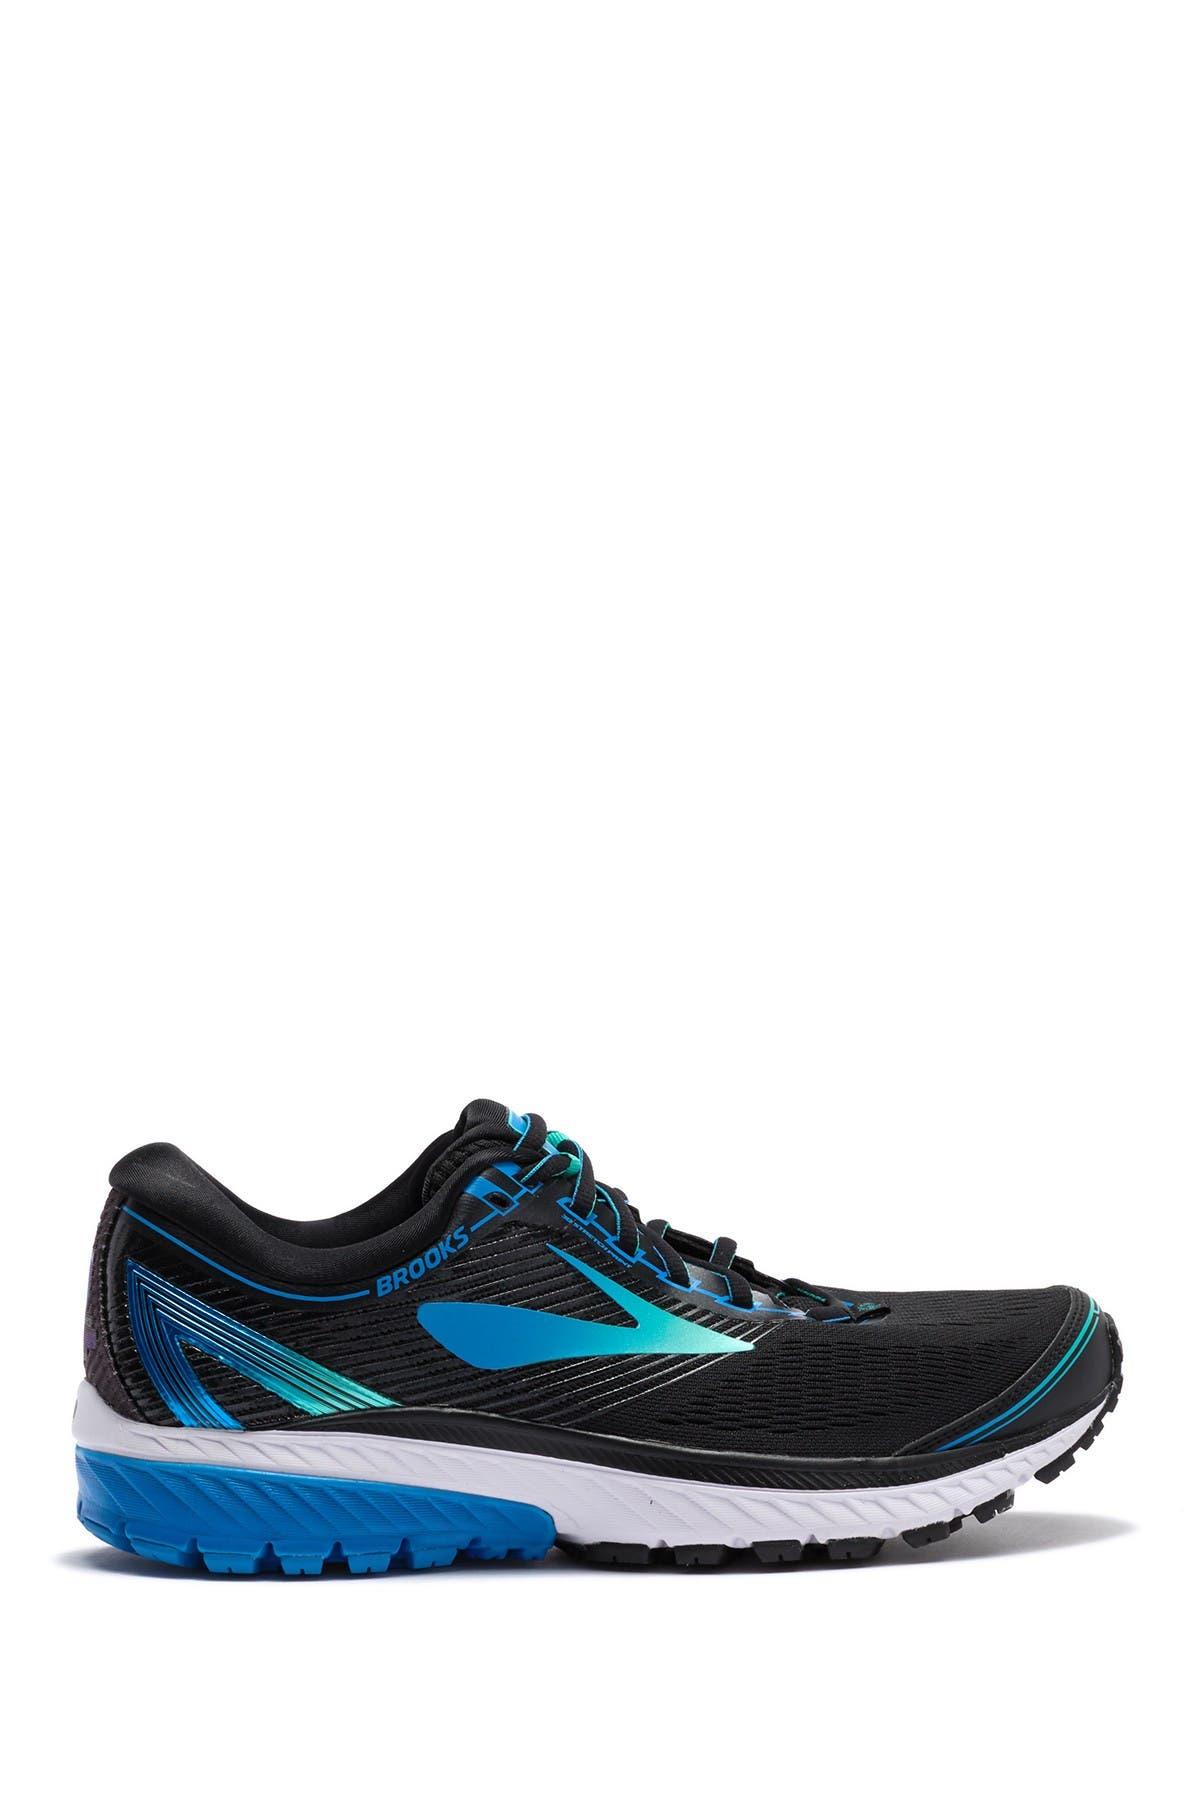 Brooks | Ghost 10 Running Shoe - Wide